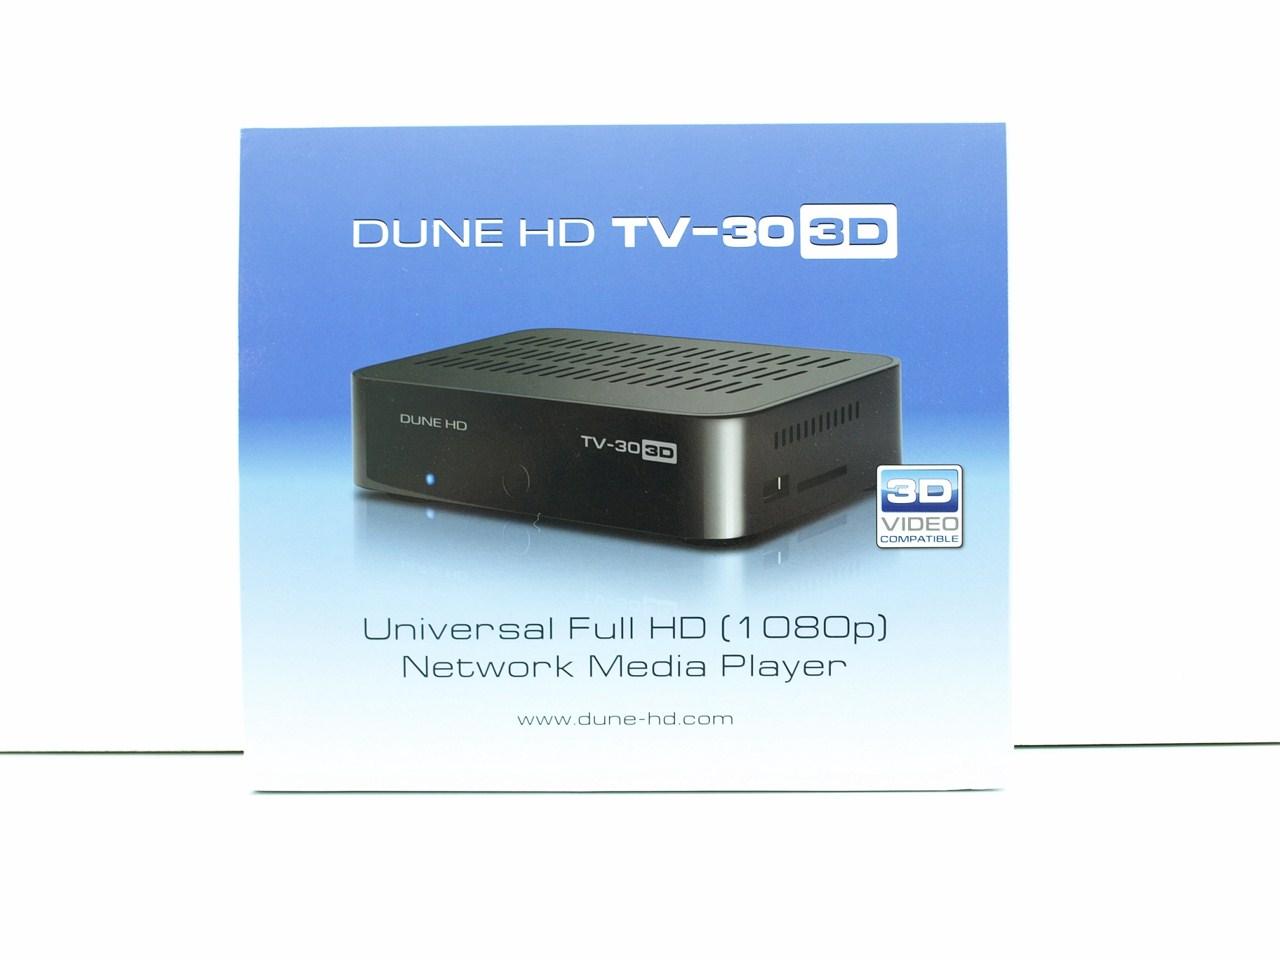 Dune HD TV-303D Universal FullHD Network Media Player Review